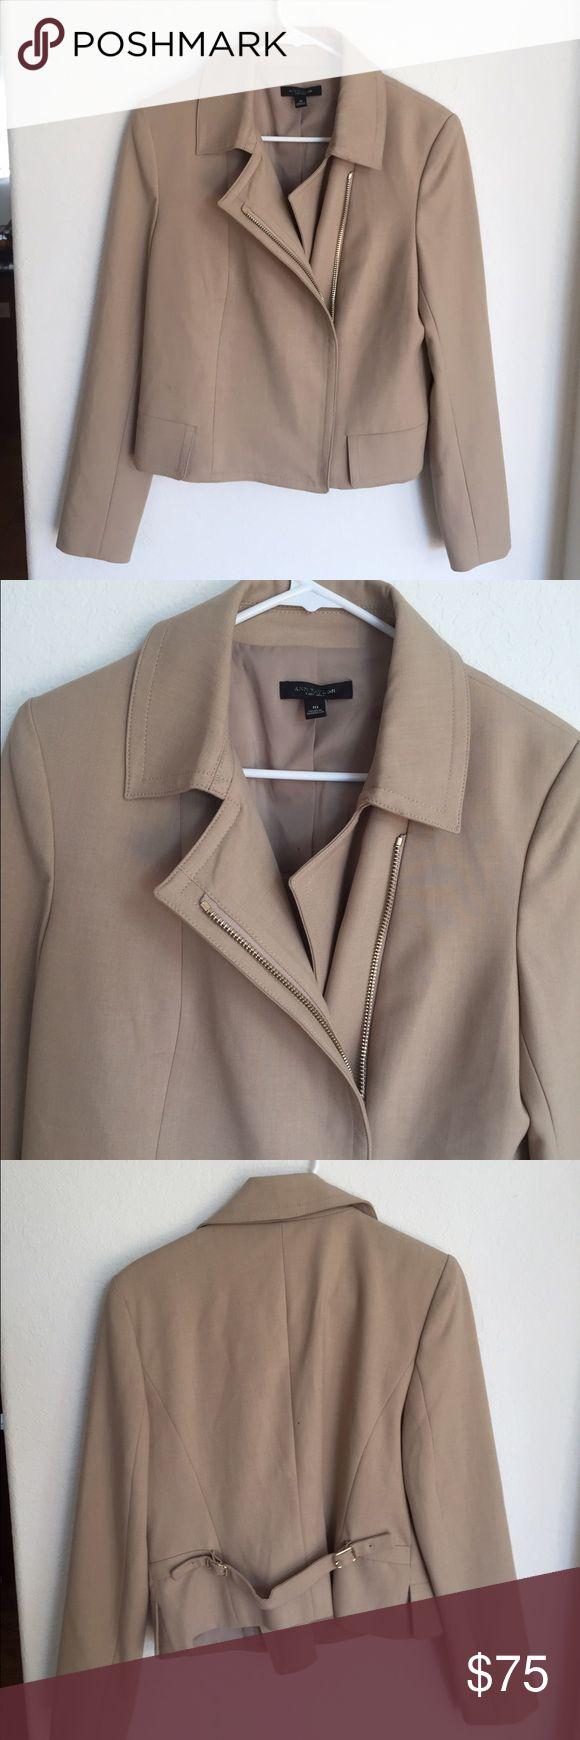 Ann Taylor Beige Zip Up Jacket Ann Taylor size 10 khaki Beige zip up coat Ann Taylor Jackets & Coats